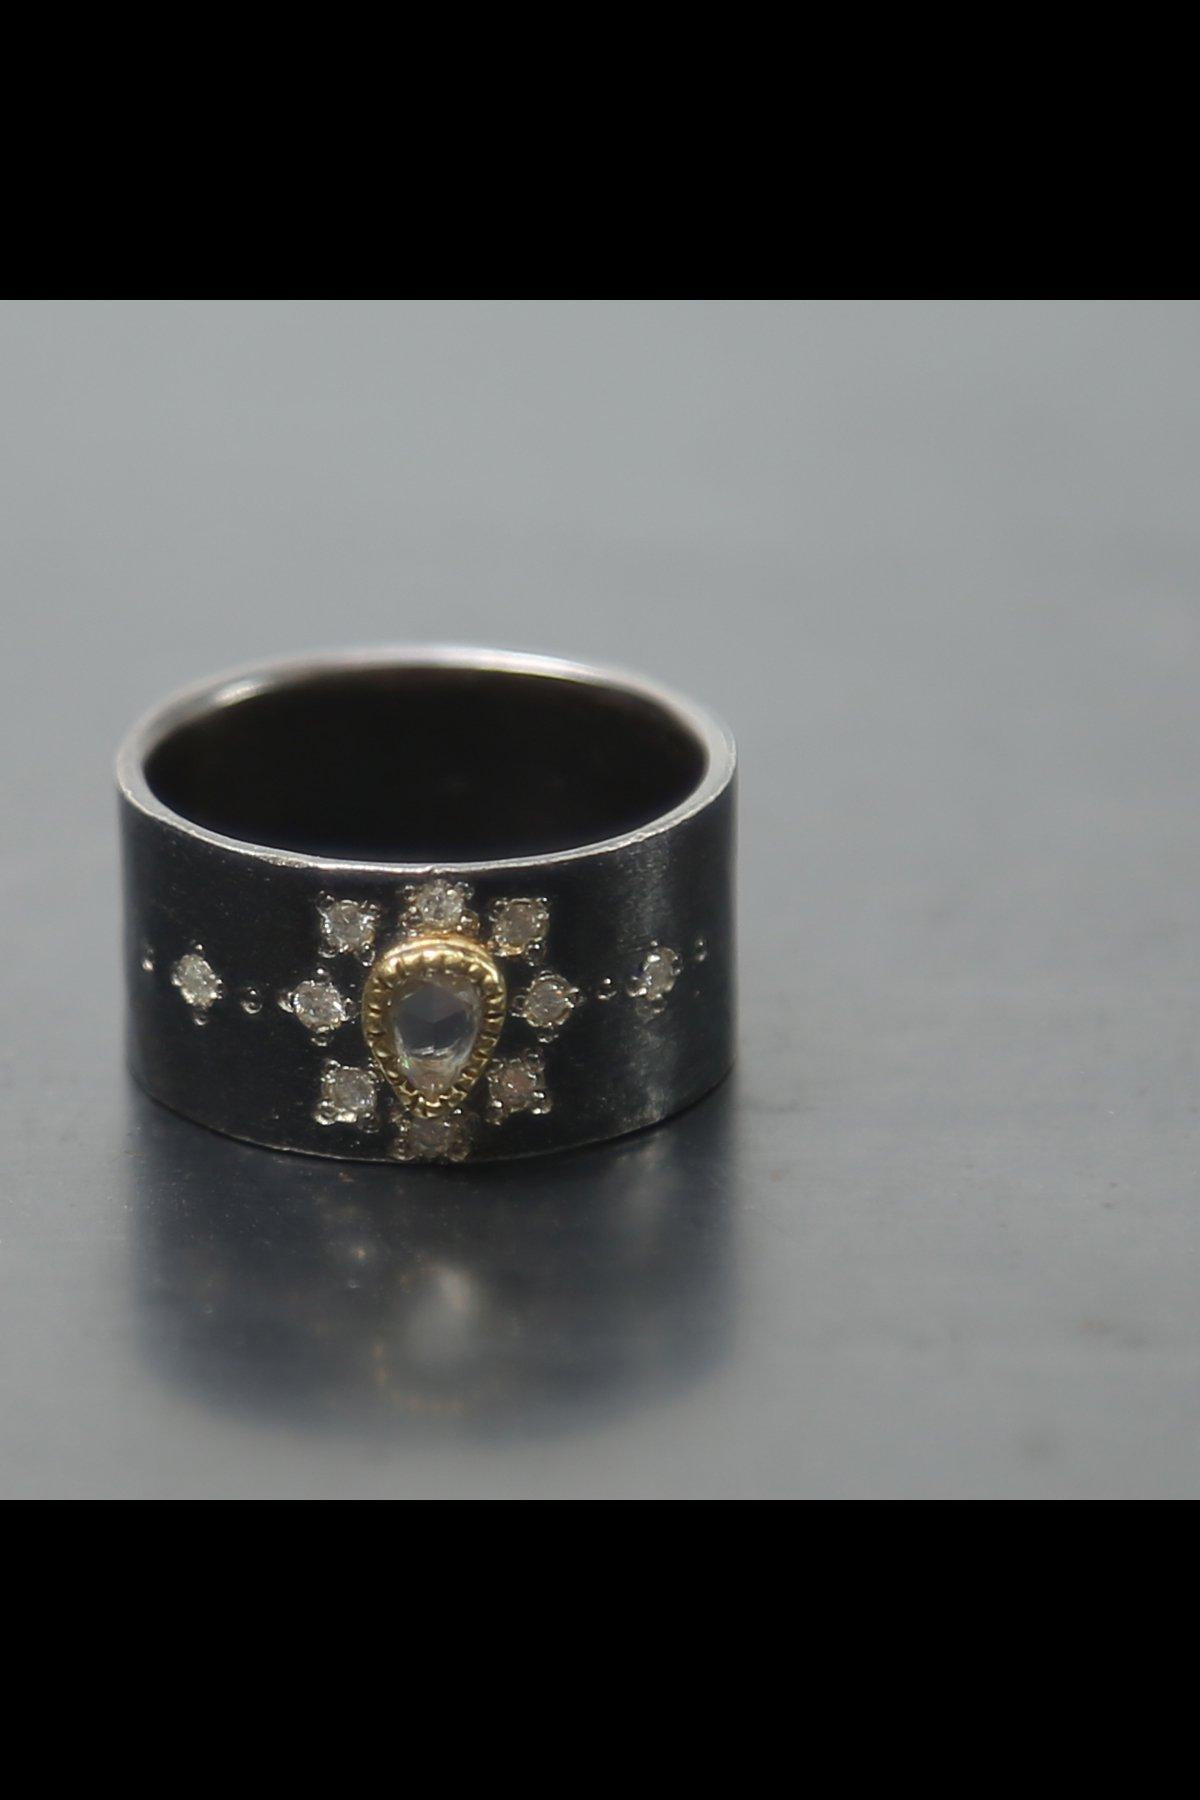 PRIMITIVE DIAMOND RING 91A-OBR13